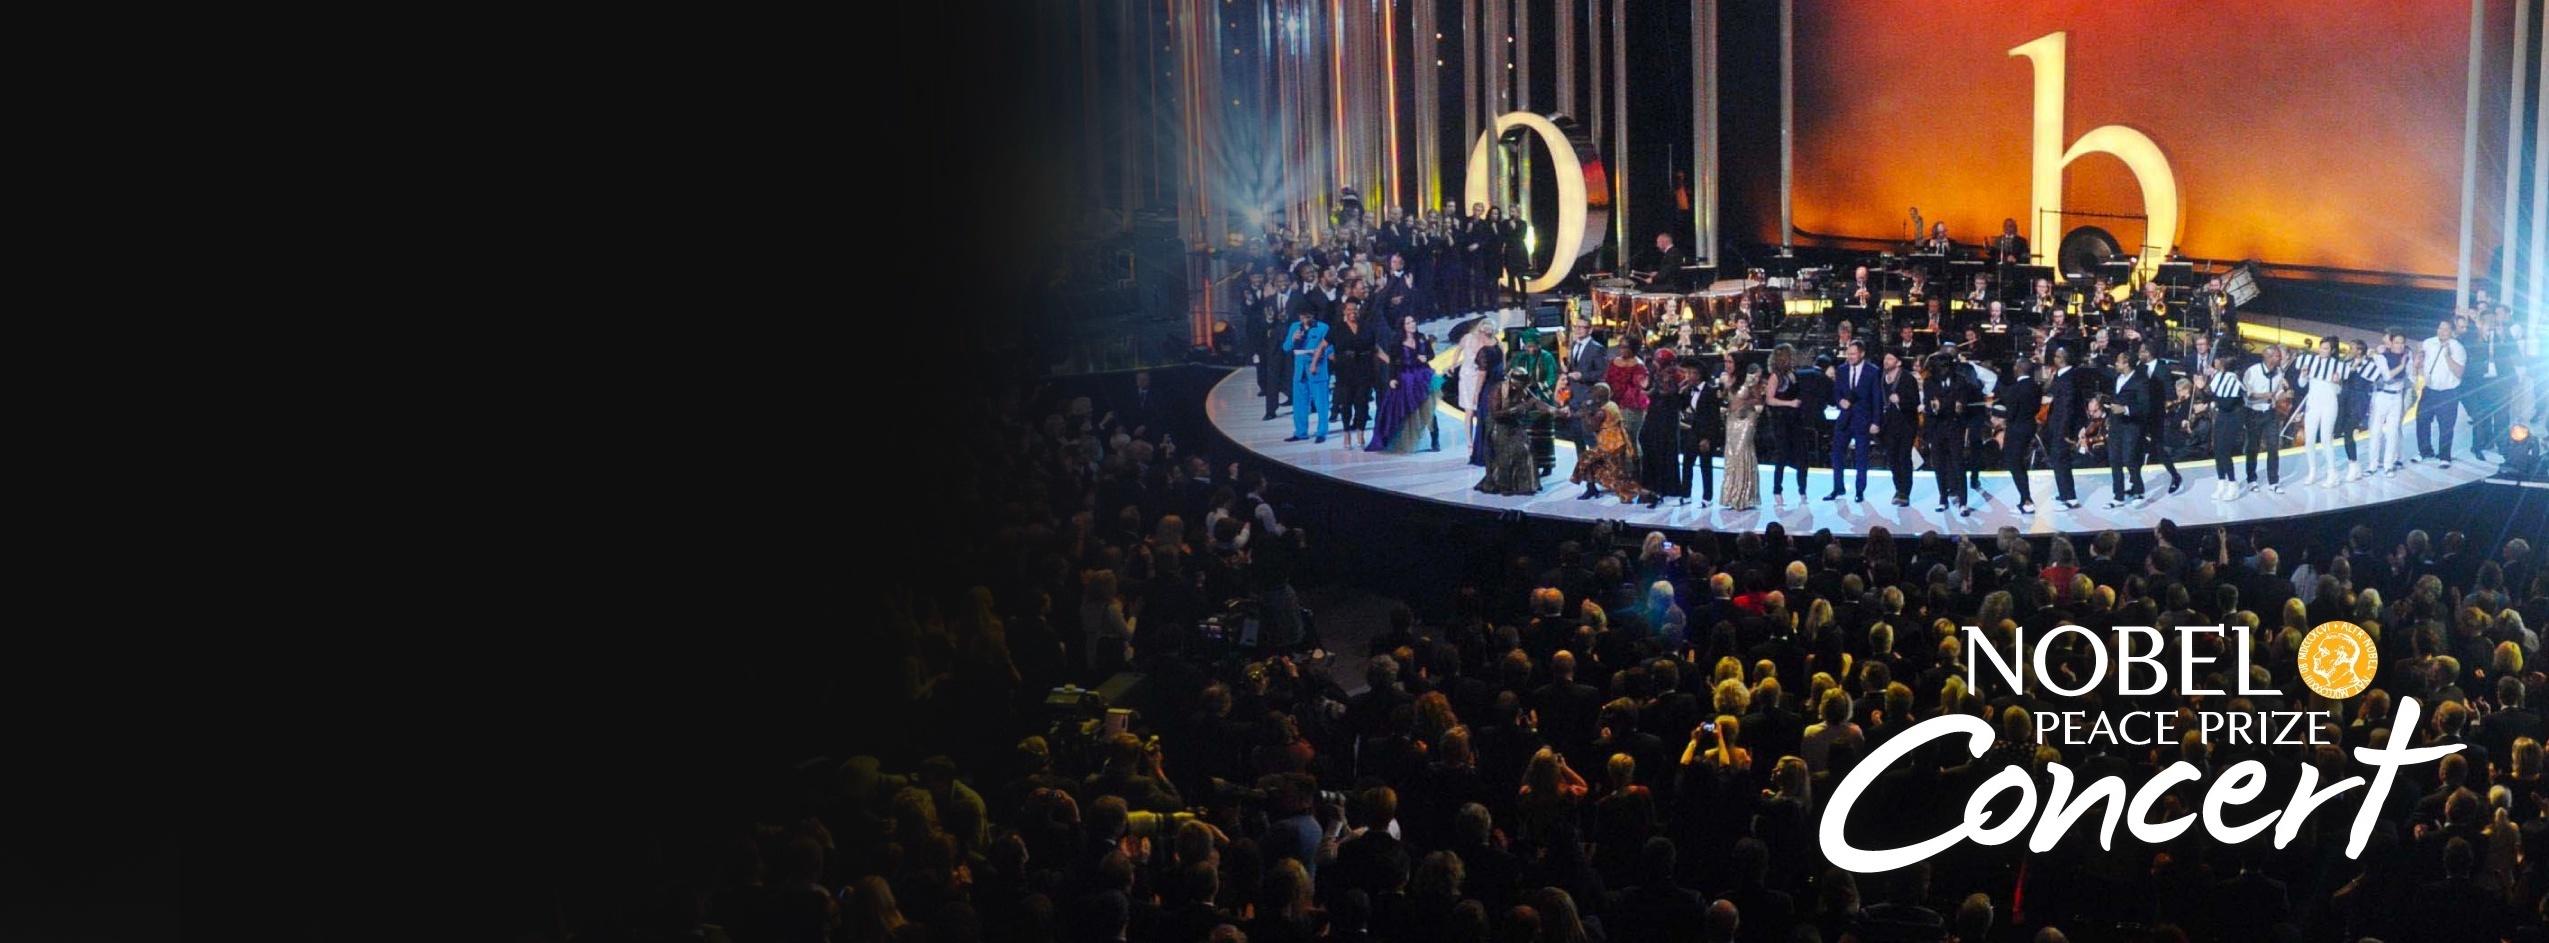 Nobel Peace Prize Concert Branding